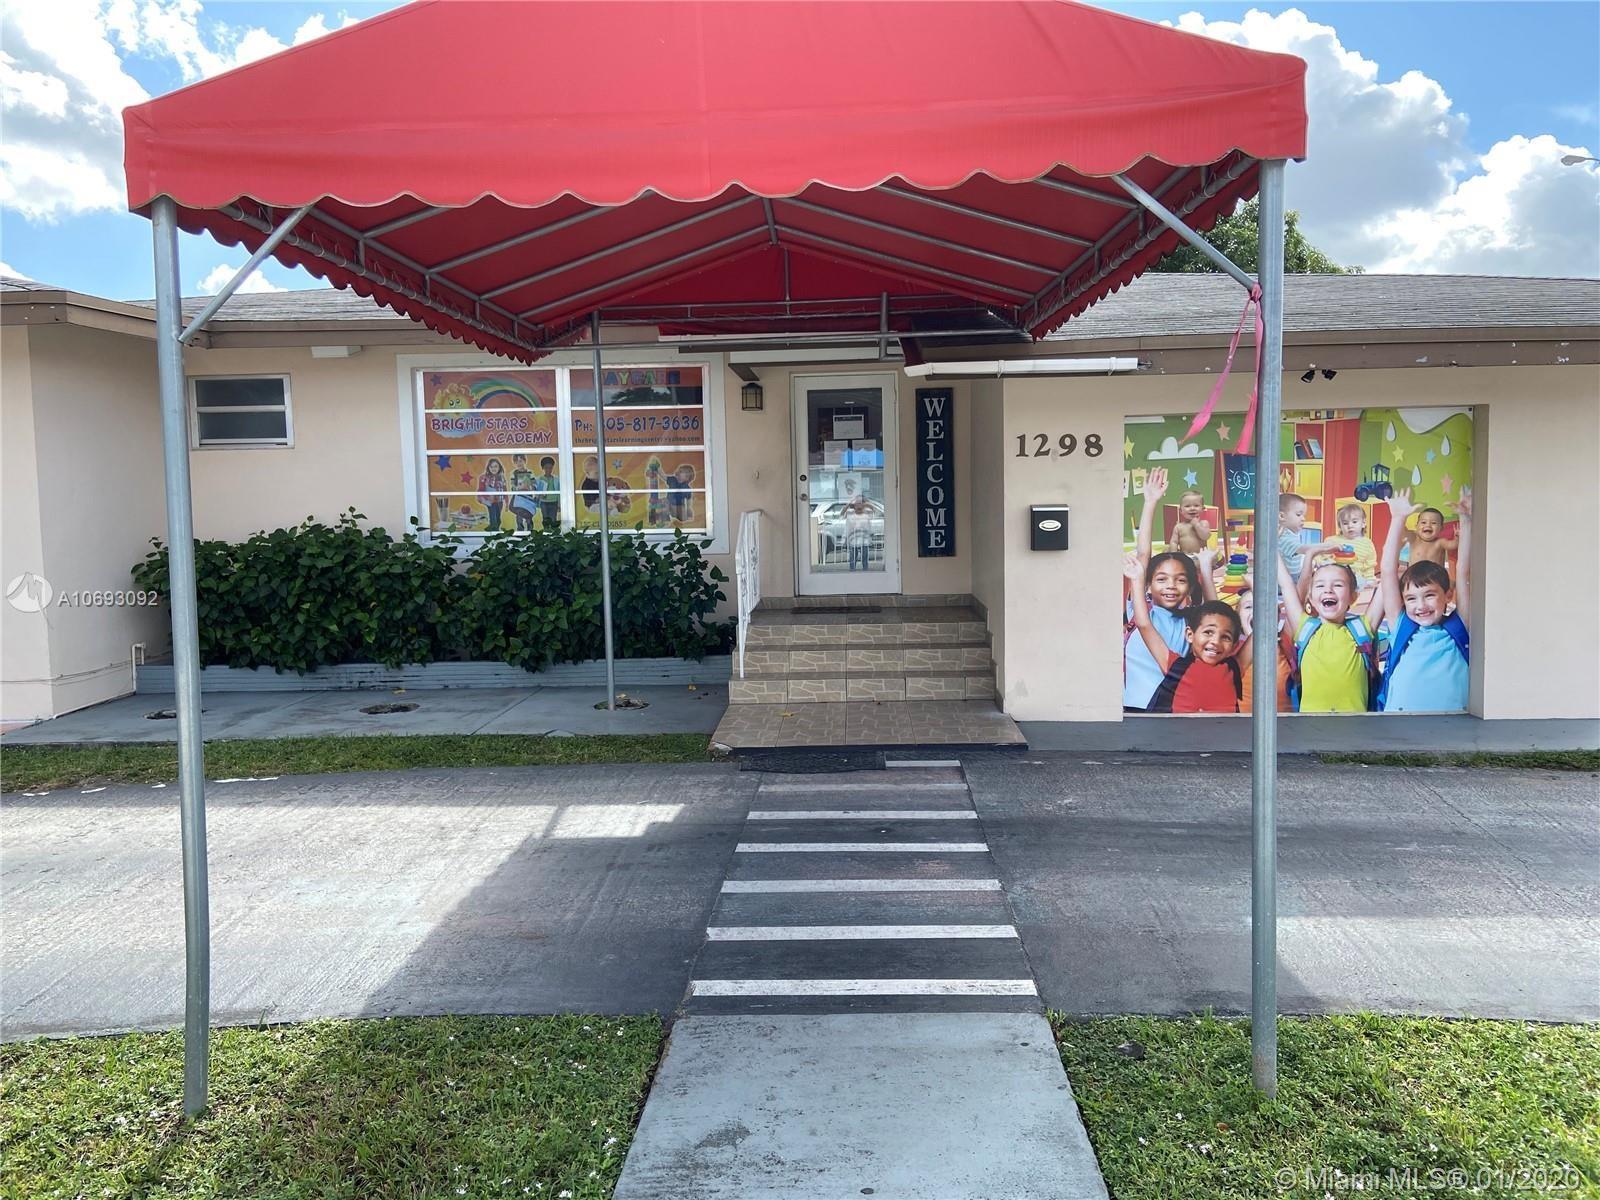 W Withheld, Hialeah, FL 33012